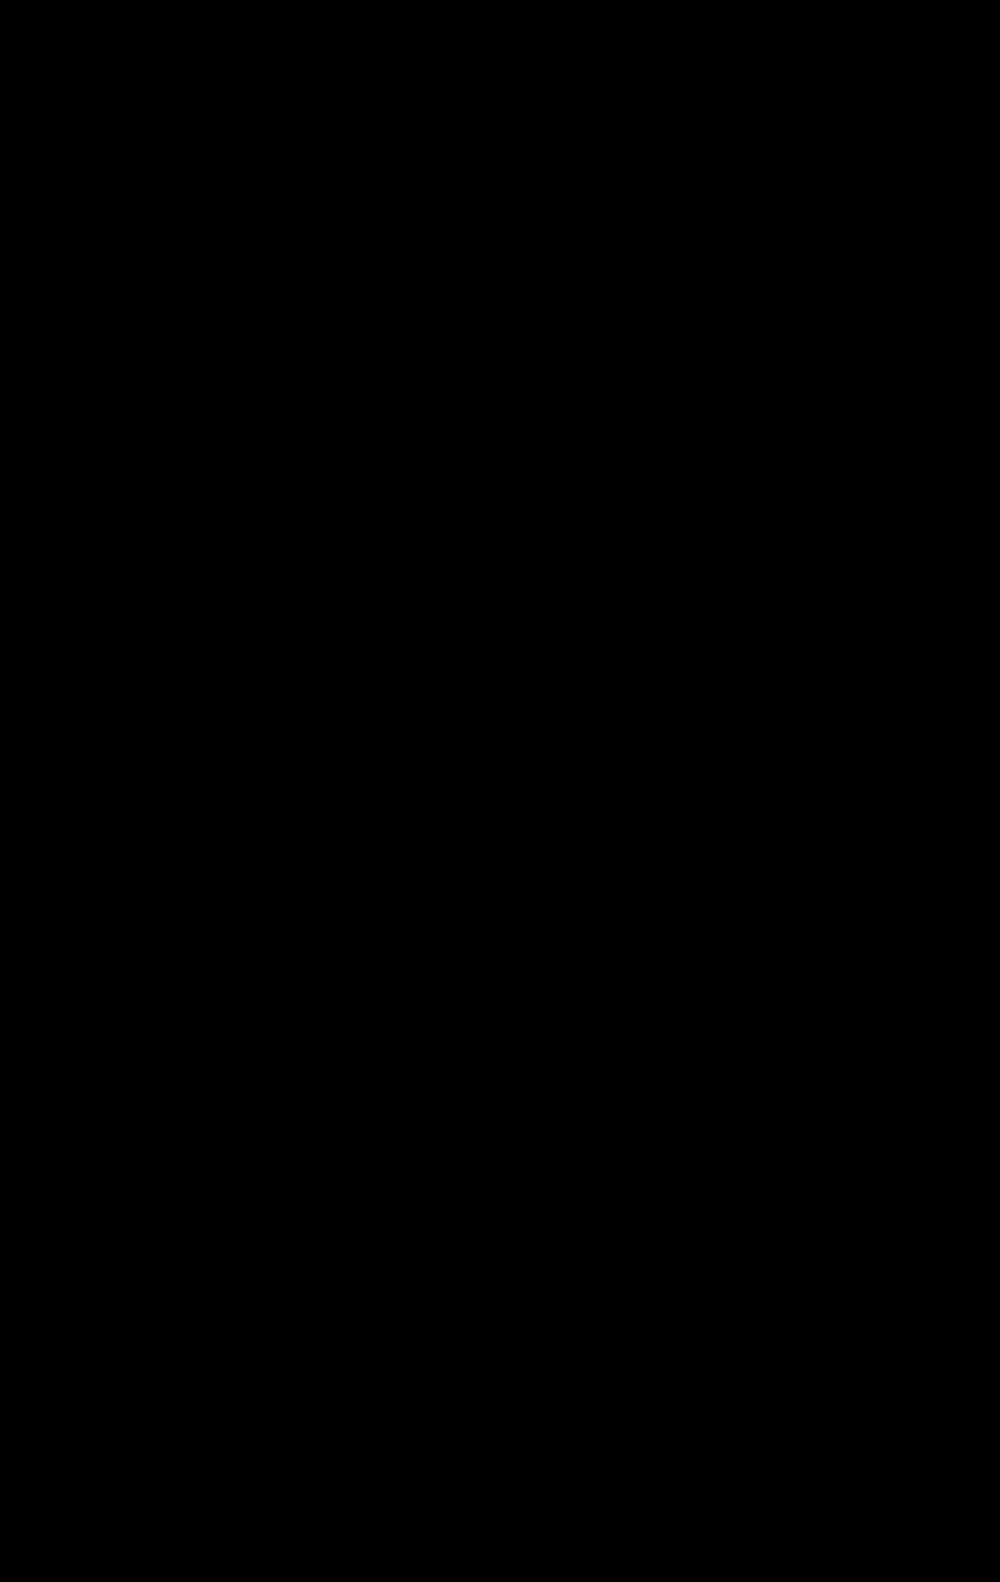 Jean dujardin marion cotillard omar sy les frenchies for Oscar jean dujardin